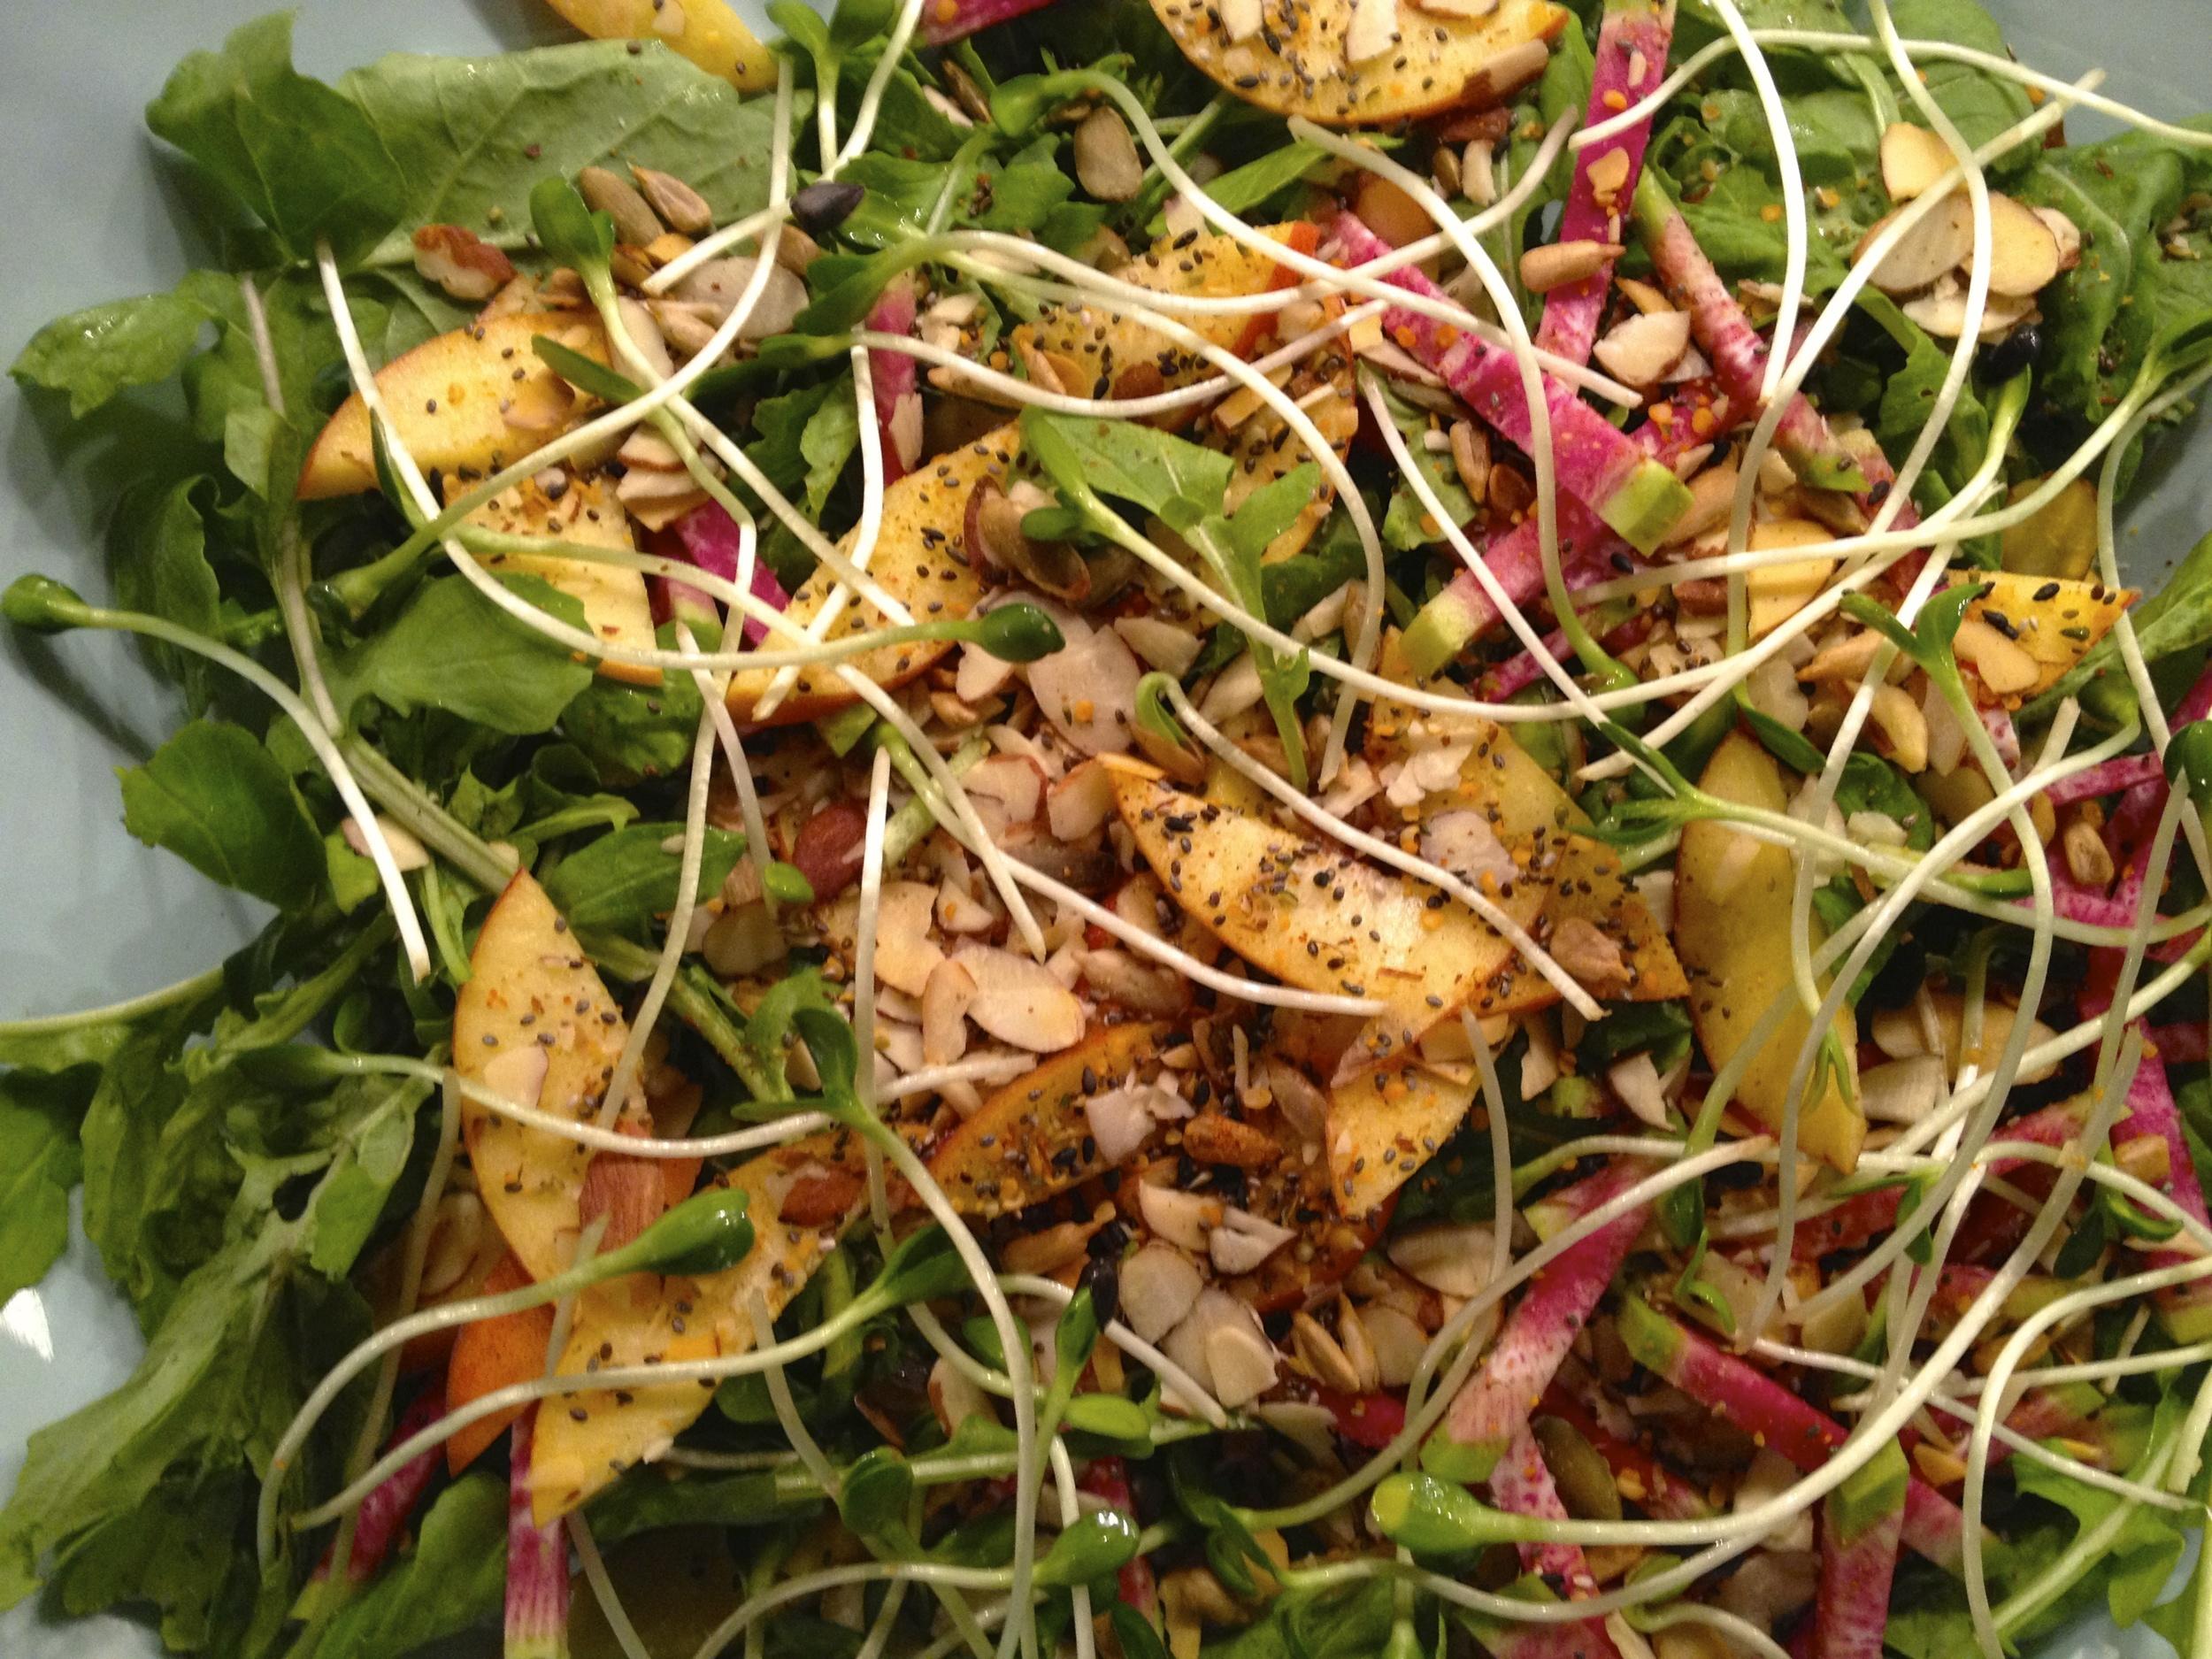 arugula salad with super seed mix and basil vinaigrette